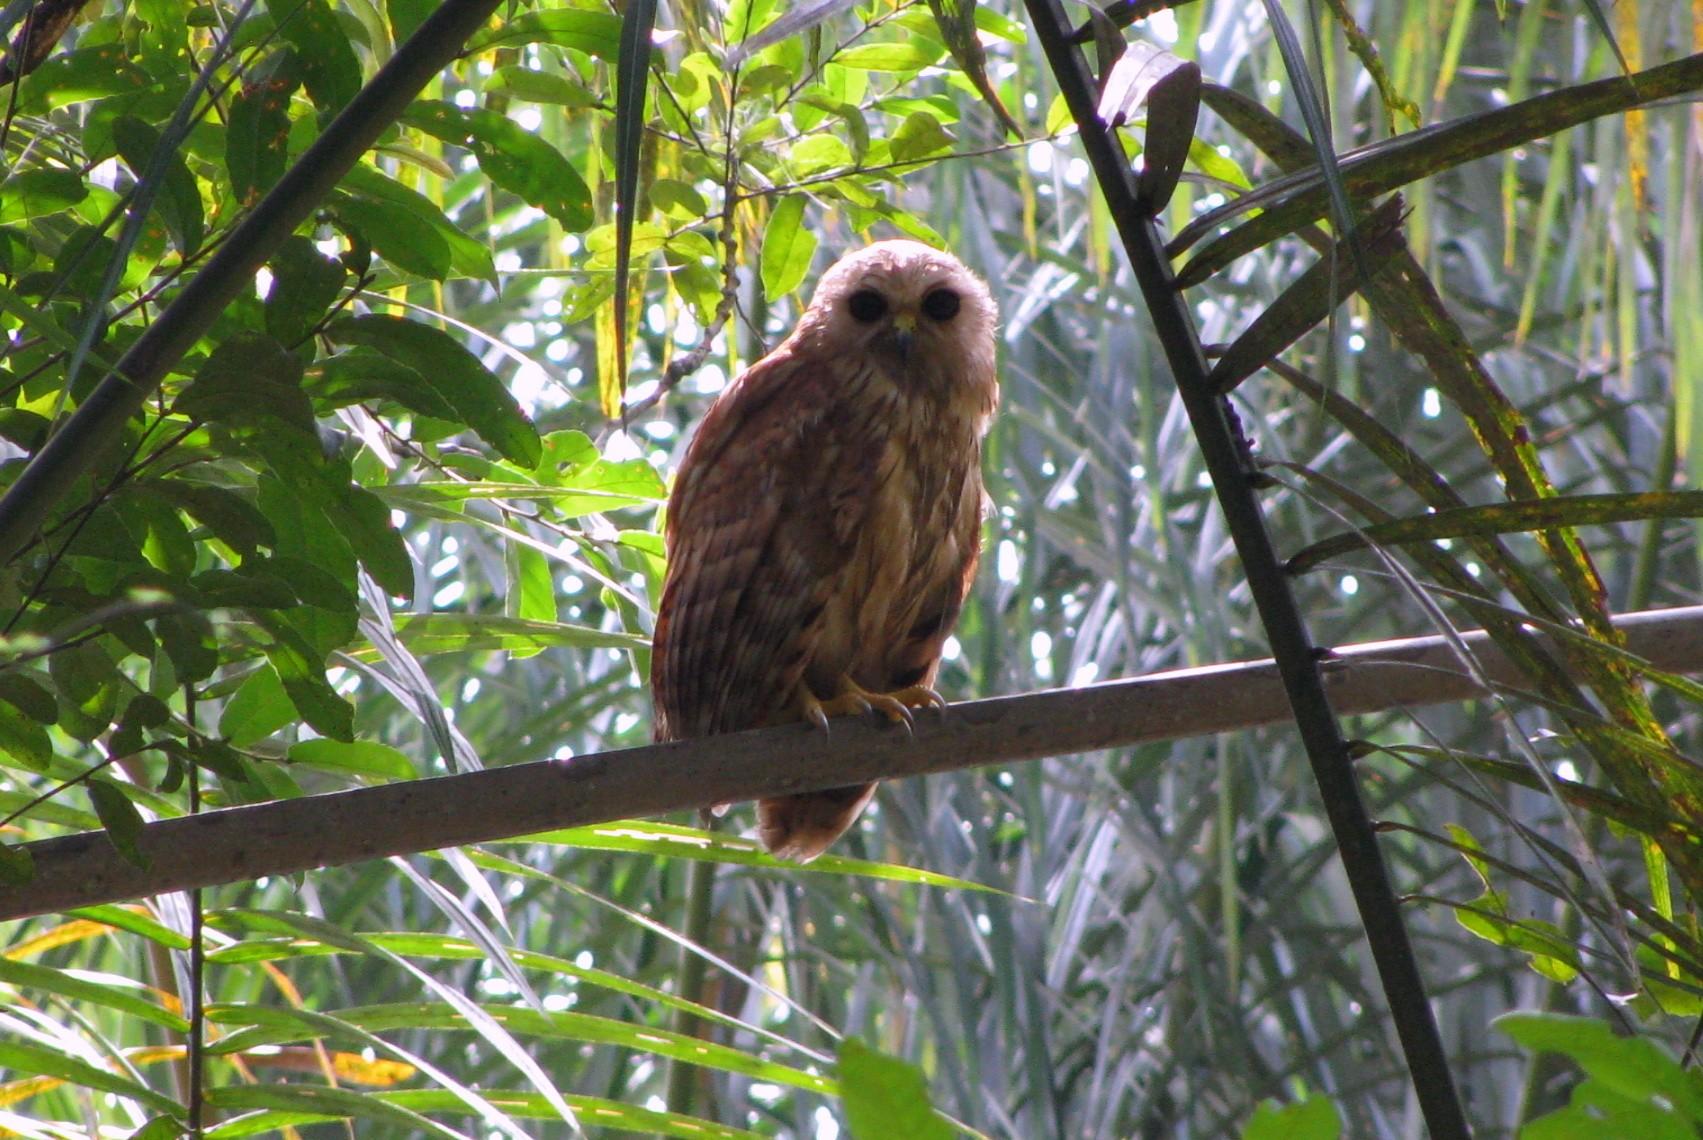 Rufous Fishing-Owl - Troels Eske Ortvad